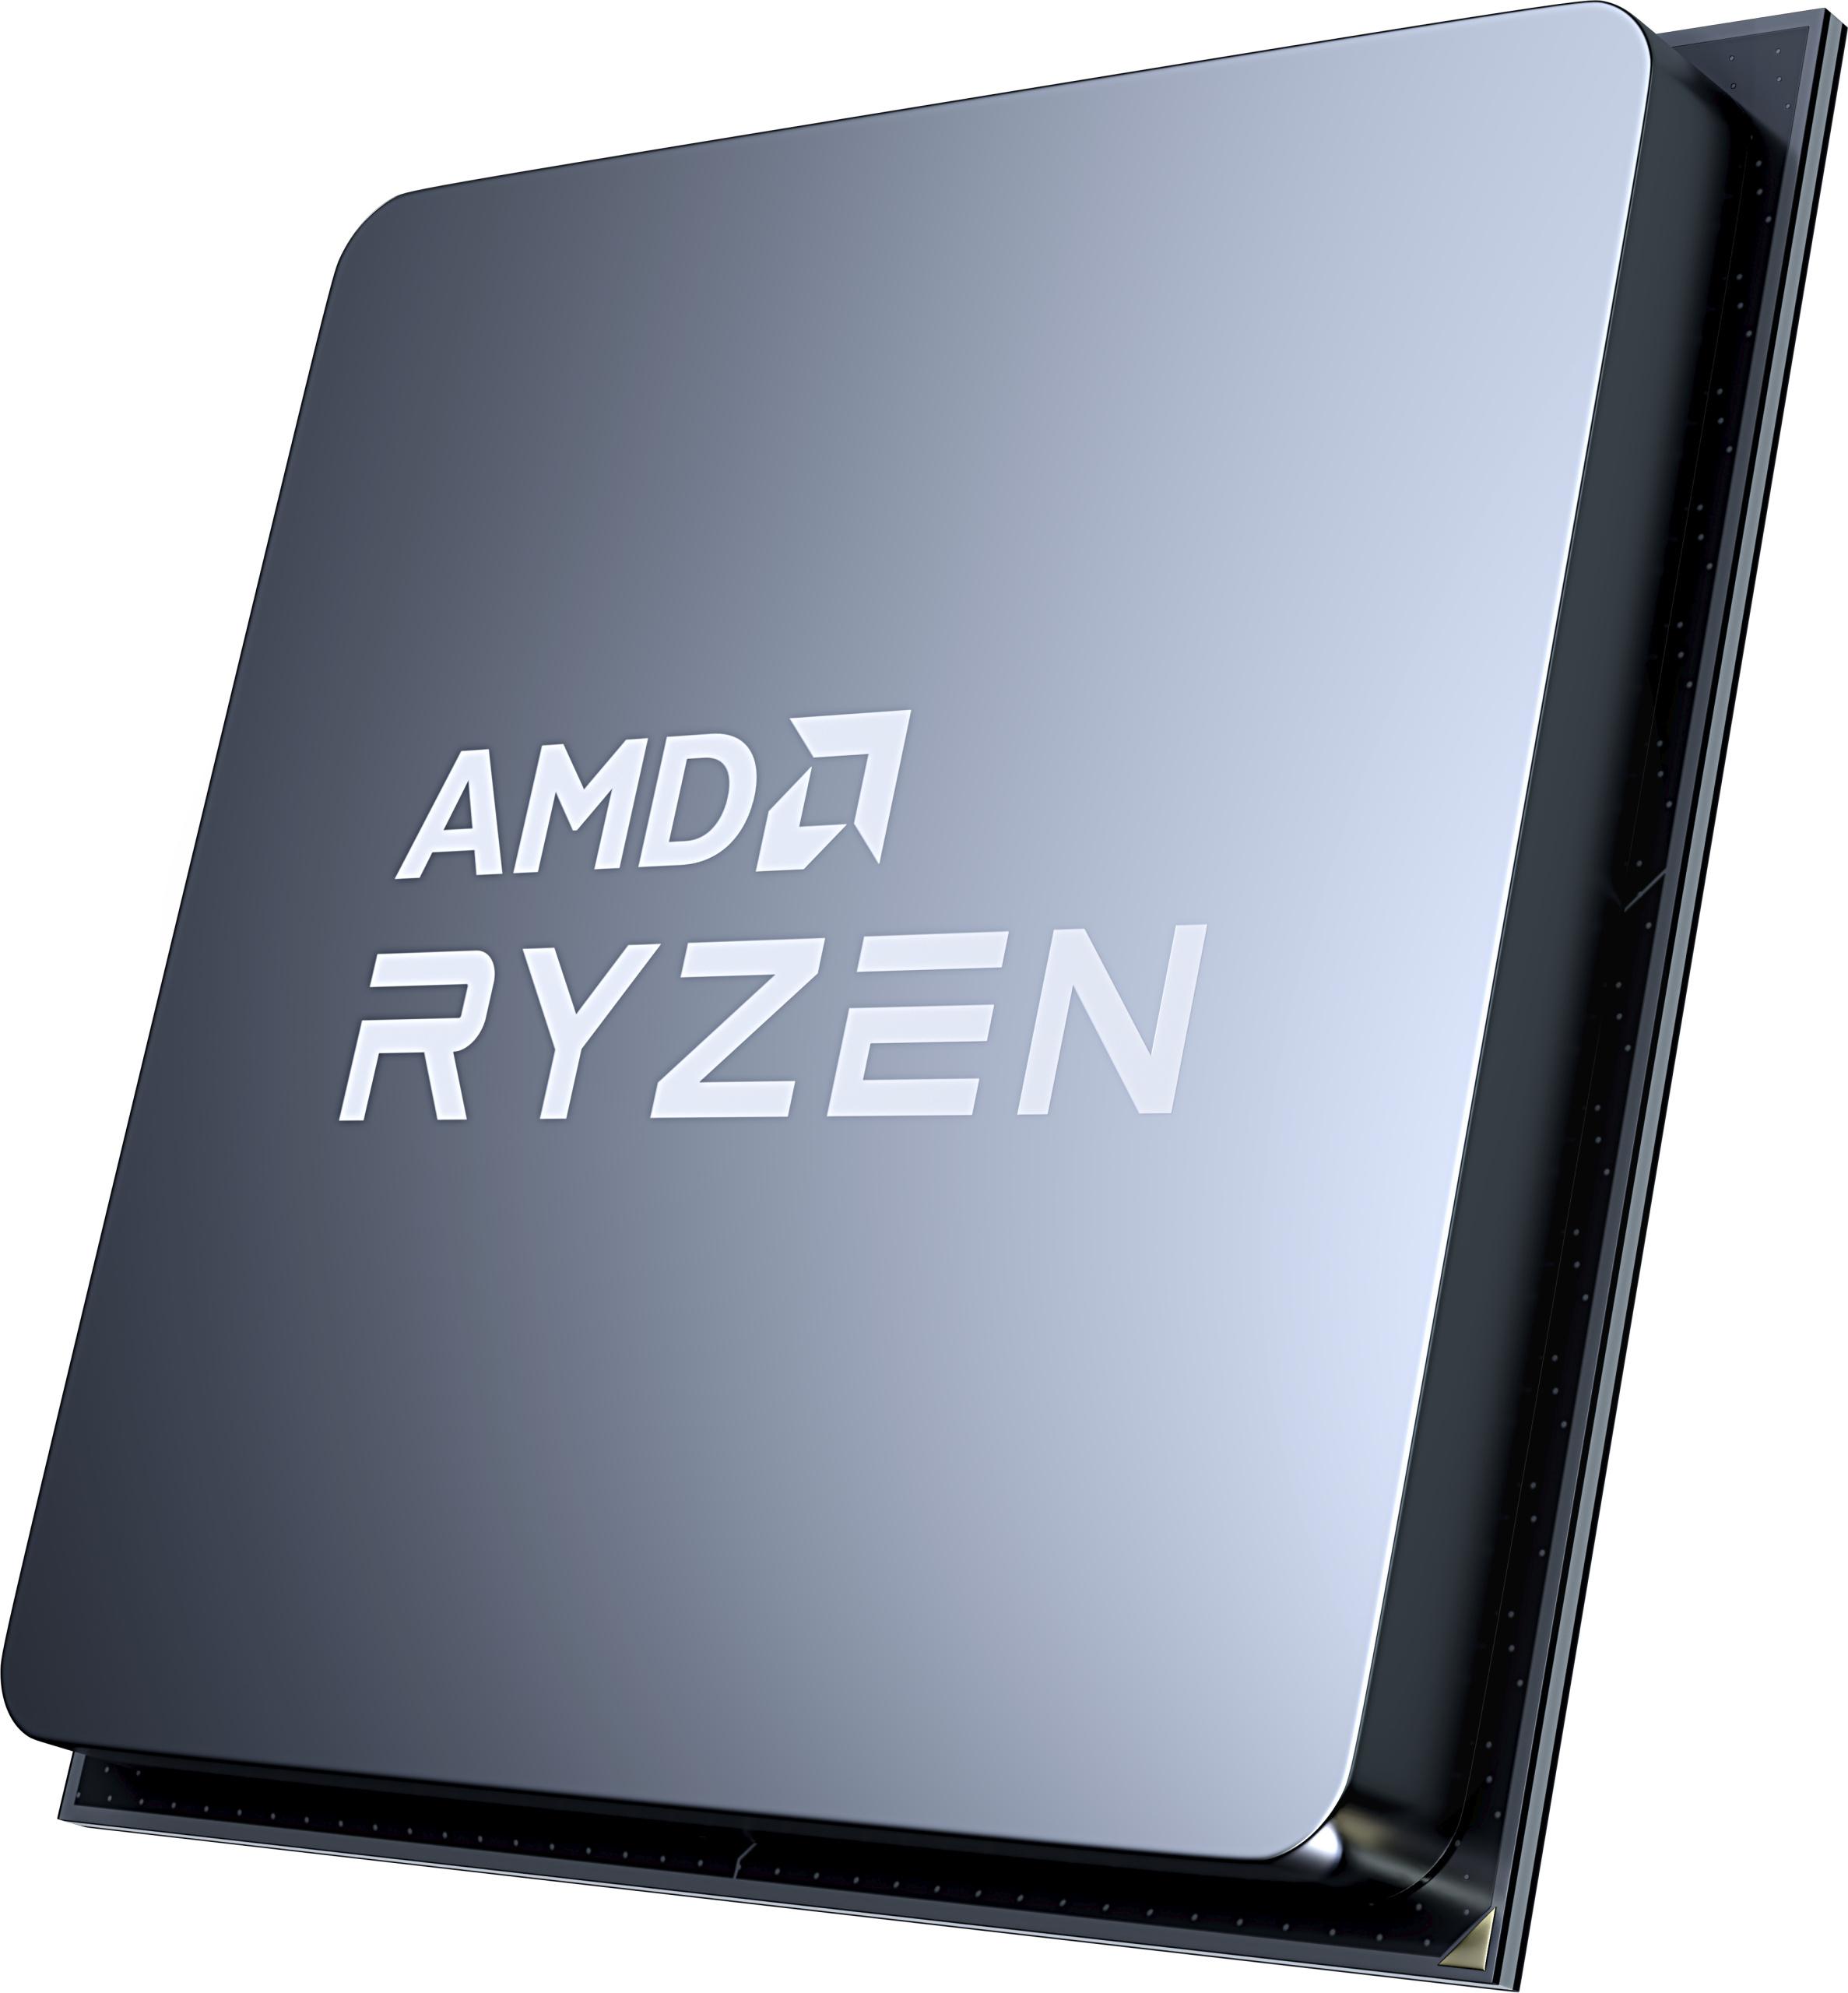 https://techboxlab.com.br/images/conteudo/Amd/2020_Ryzen_Desktop_Processor_Left.jpg